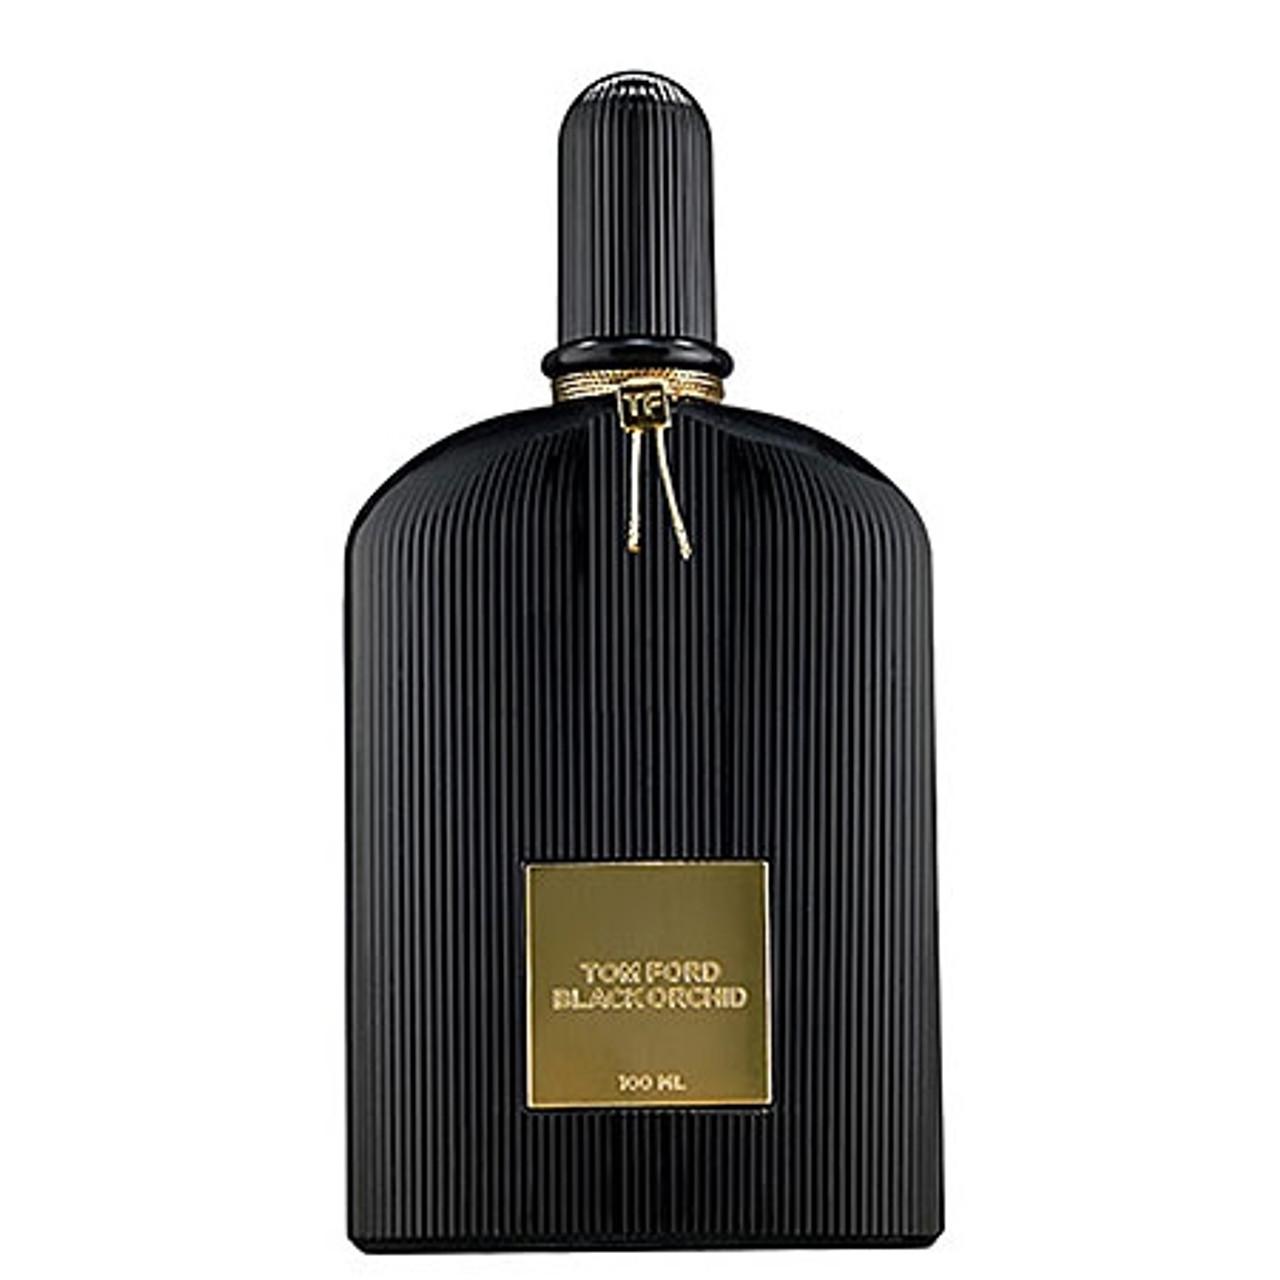 Tom Ford Black Orchid 3.4 OZ